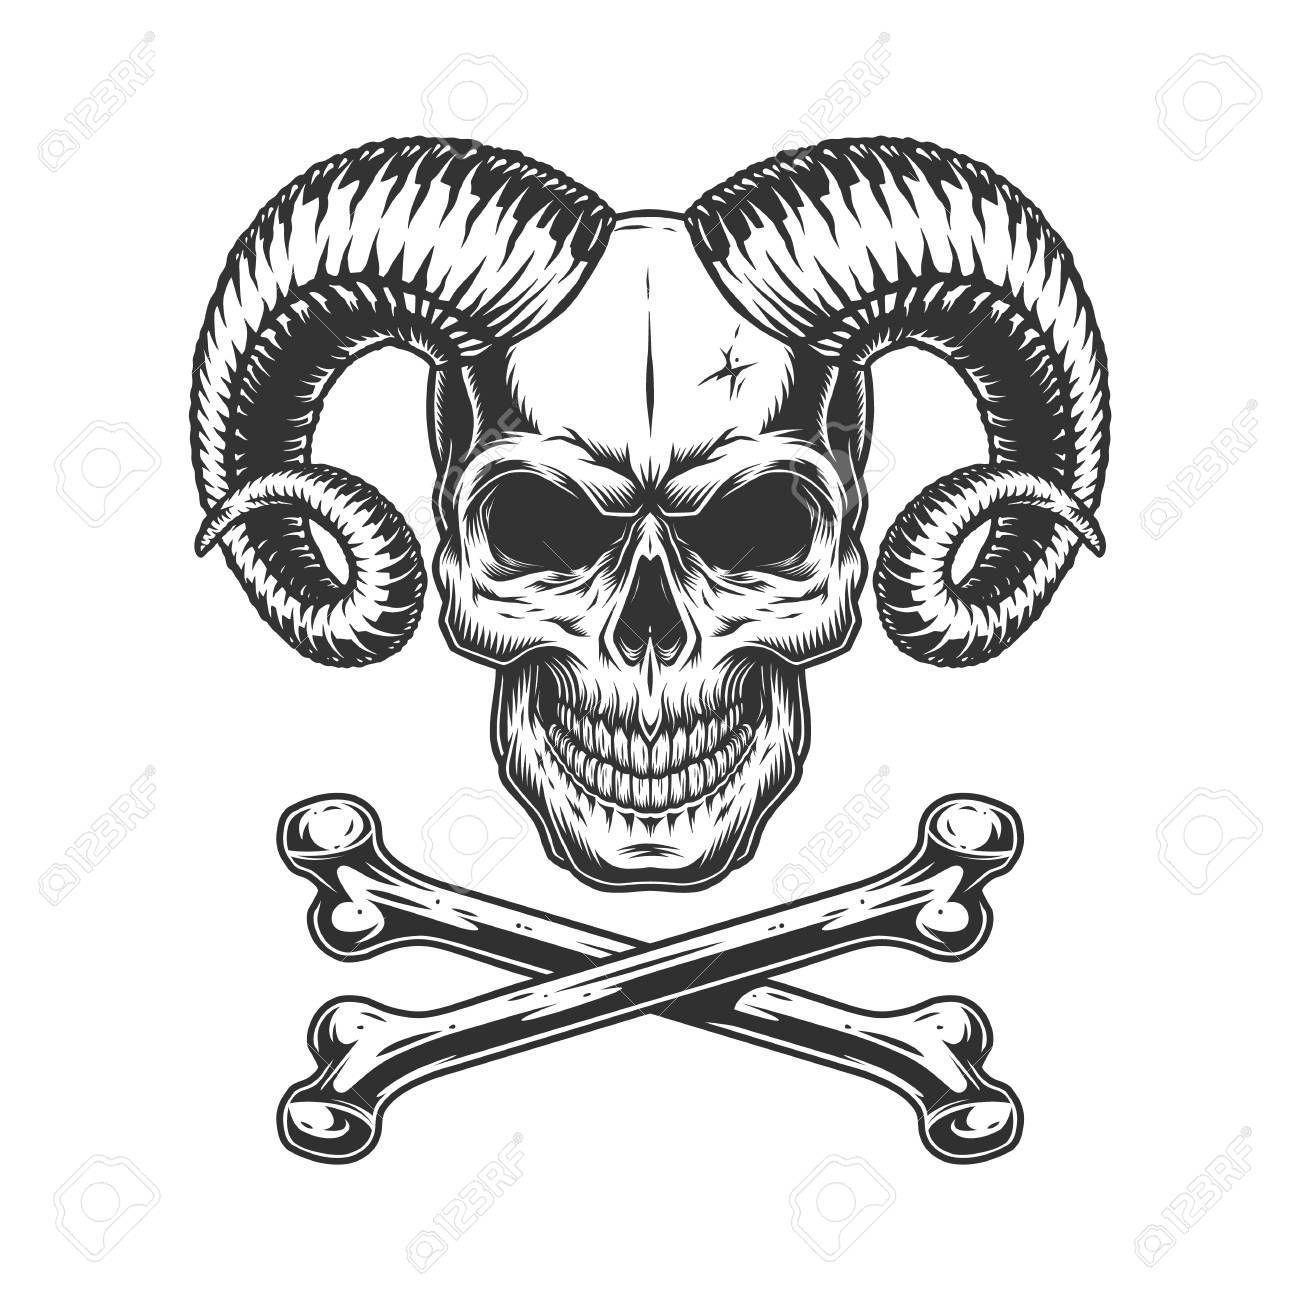 Red Demon Skull Illustration With Sacred Geometry Art Artist Black Png And Vector With Transparent Background For Free Download Skull Illustration Skull Wallpaper Skull Art